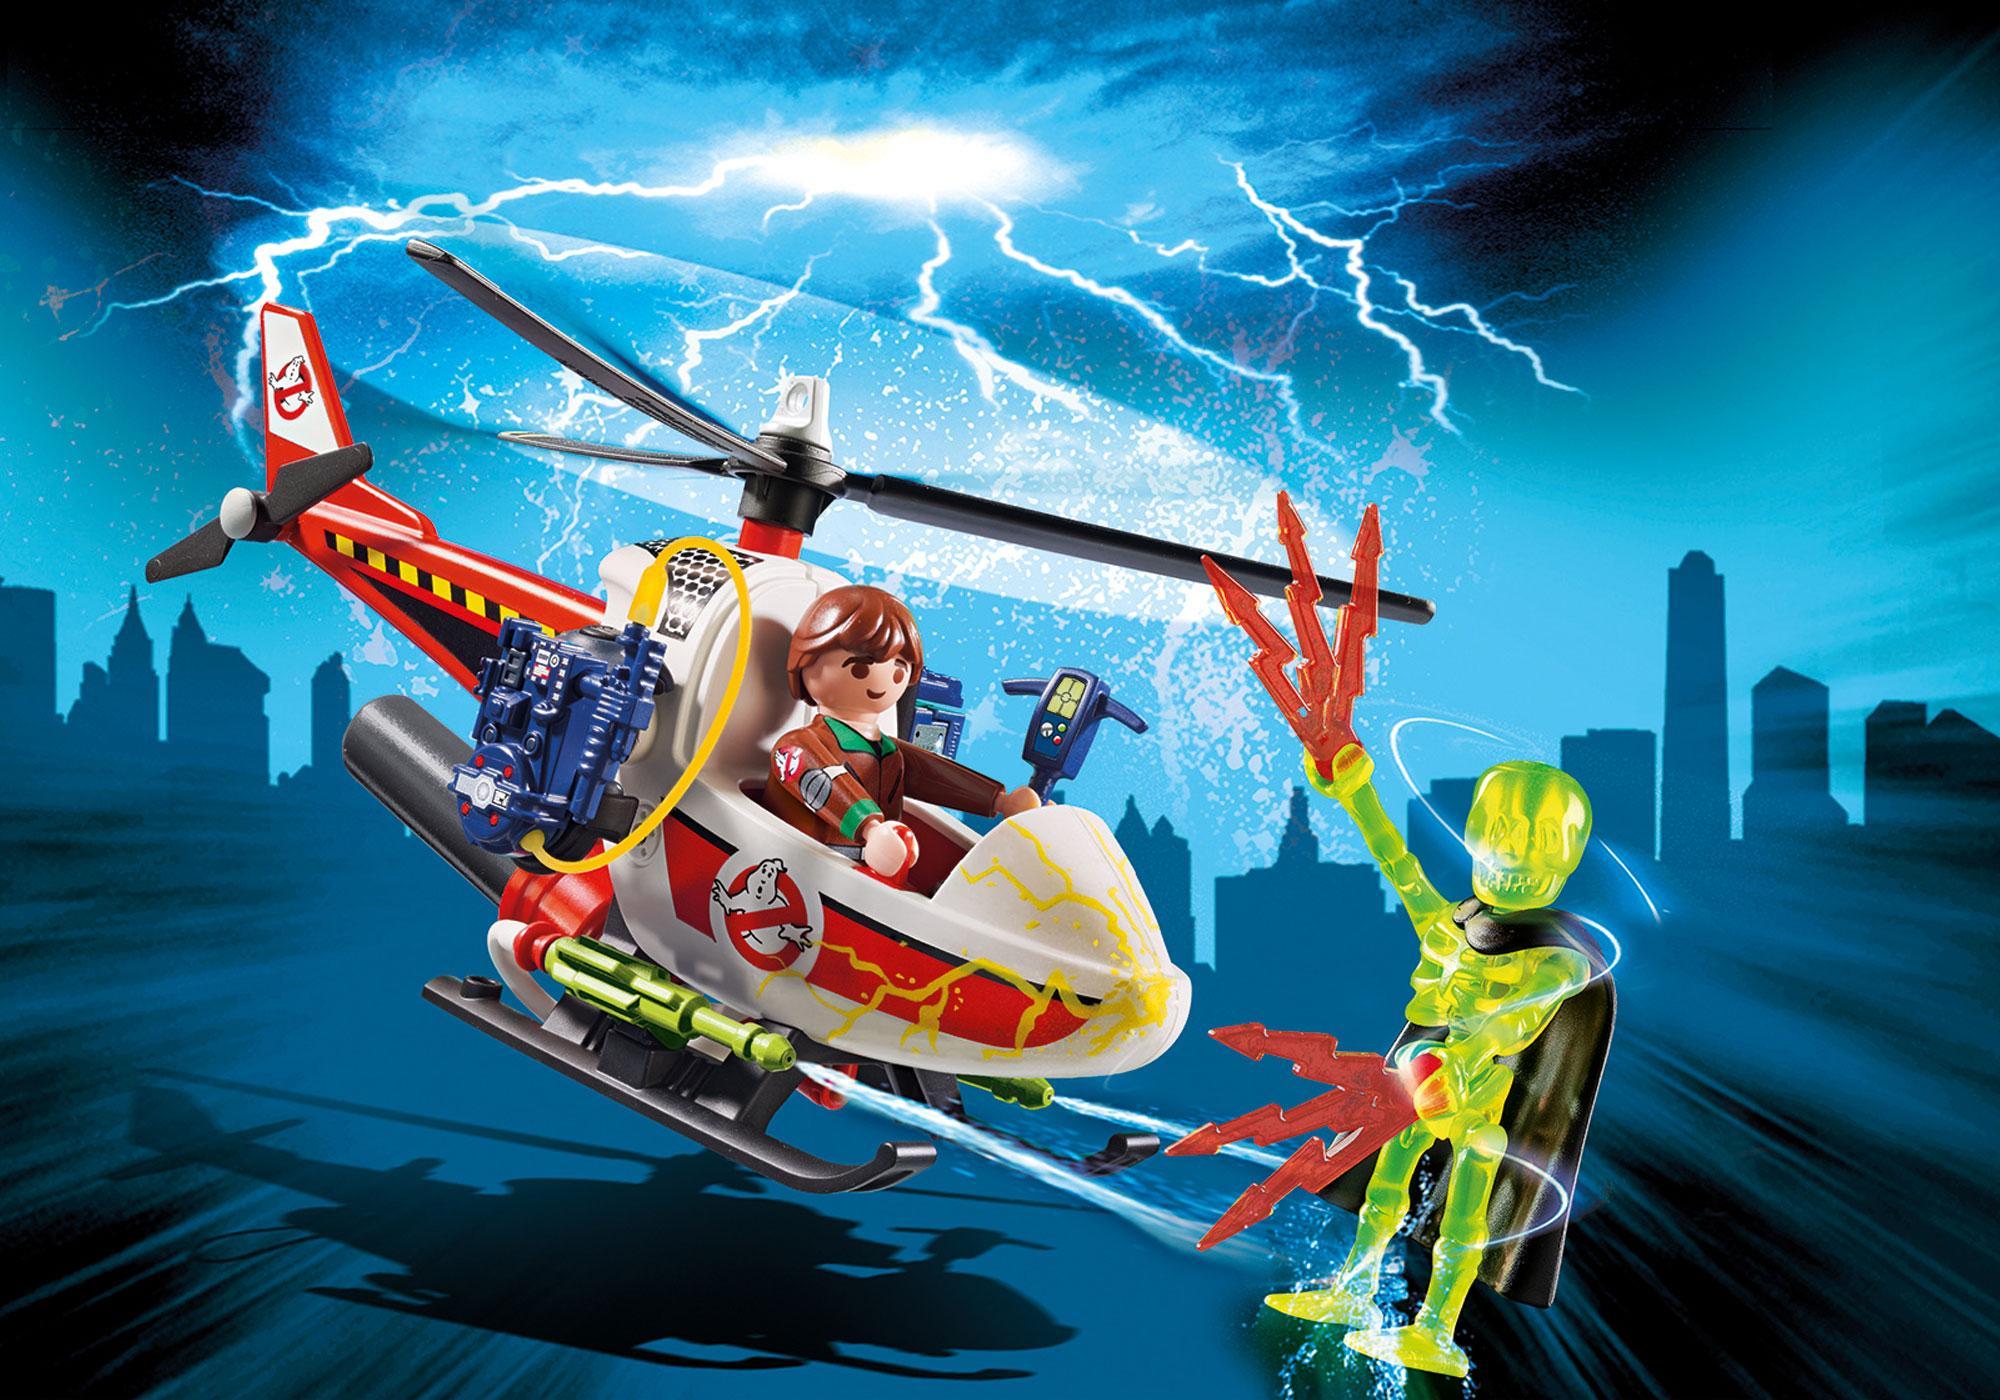 9385_product_detail/Venkman med helikopter